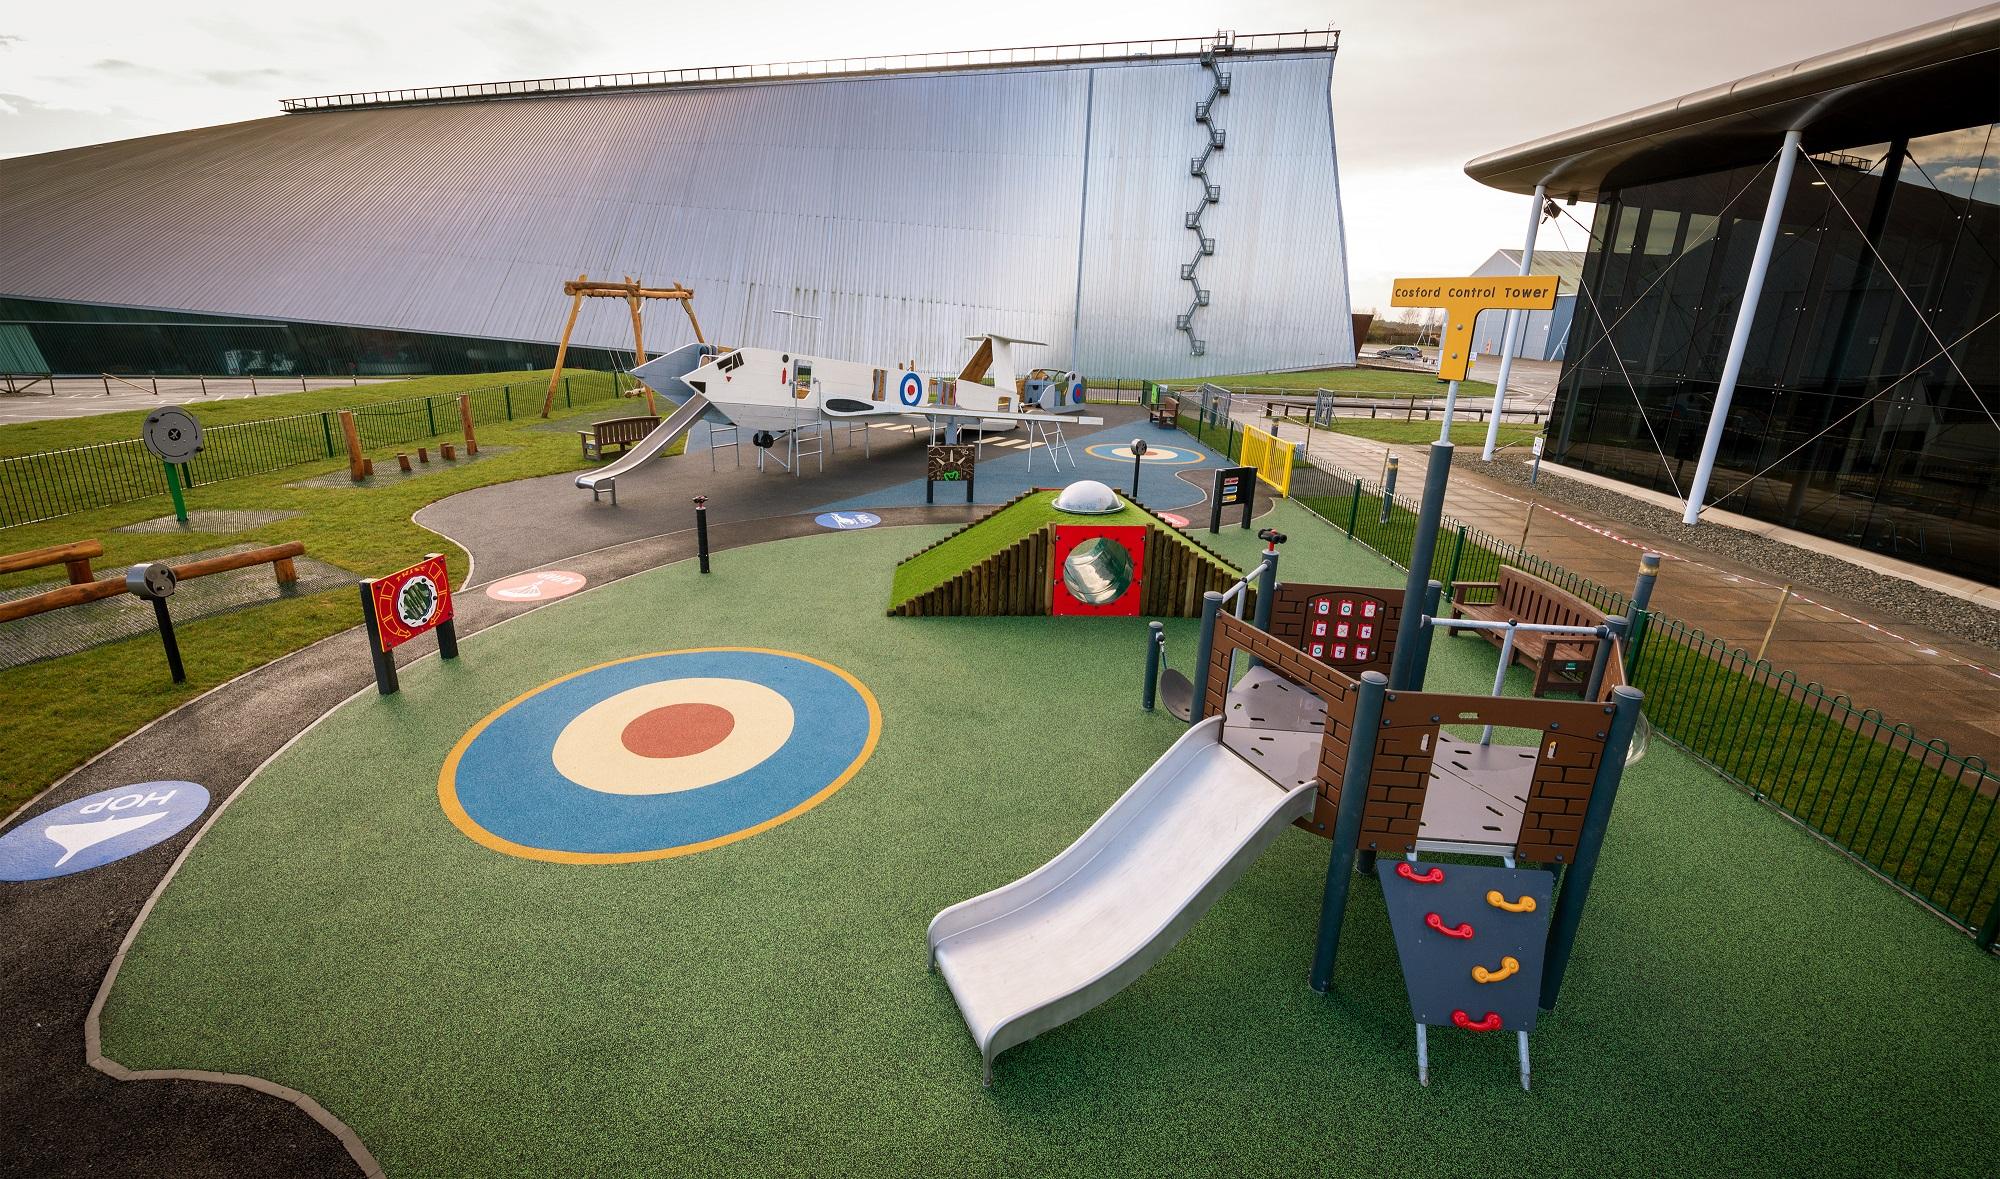 RAF themed playground